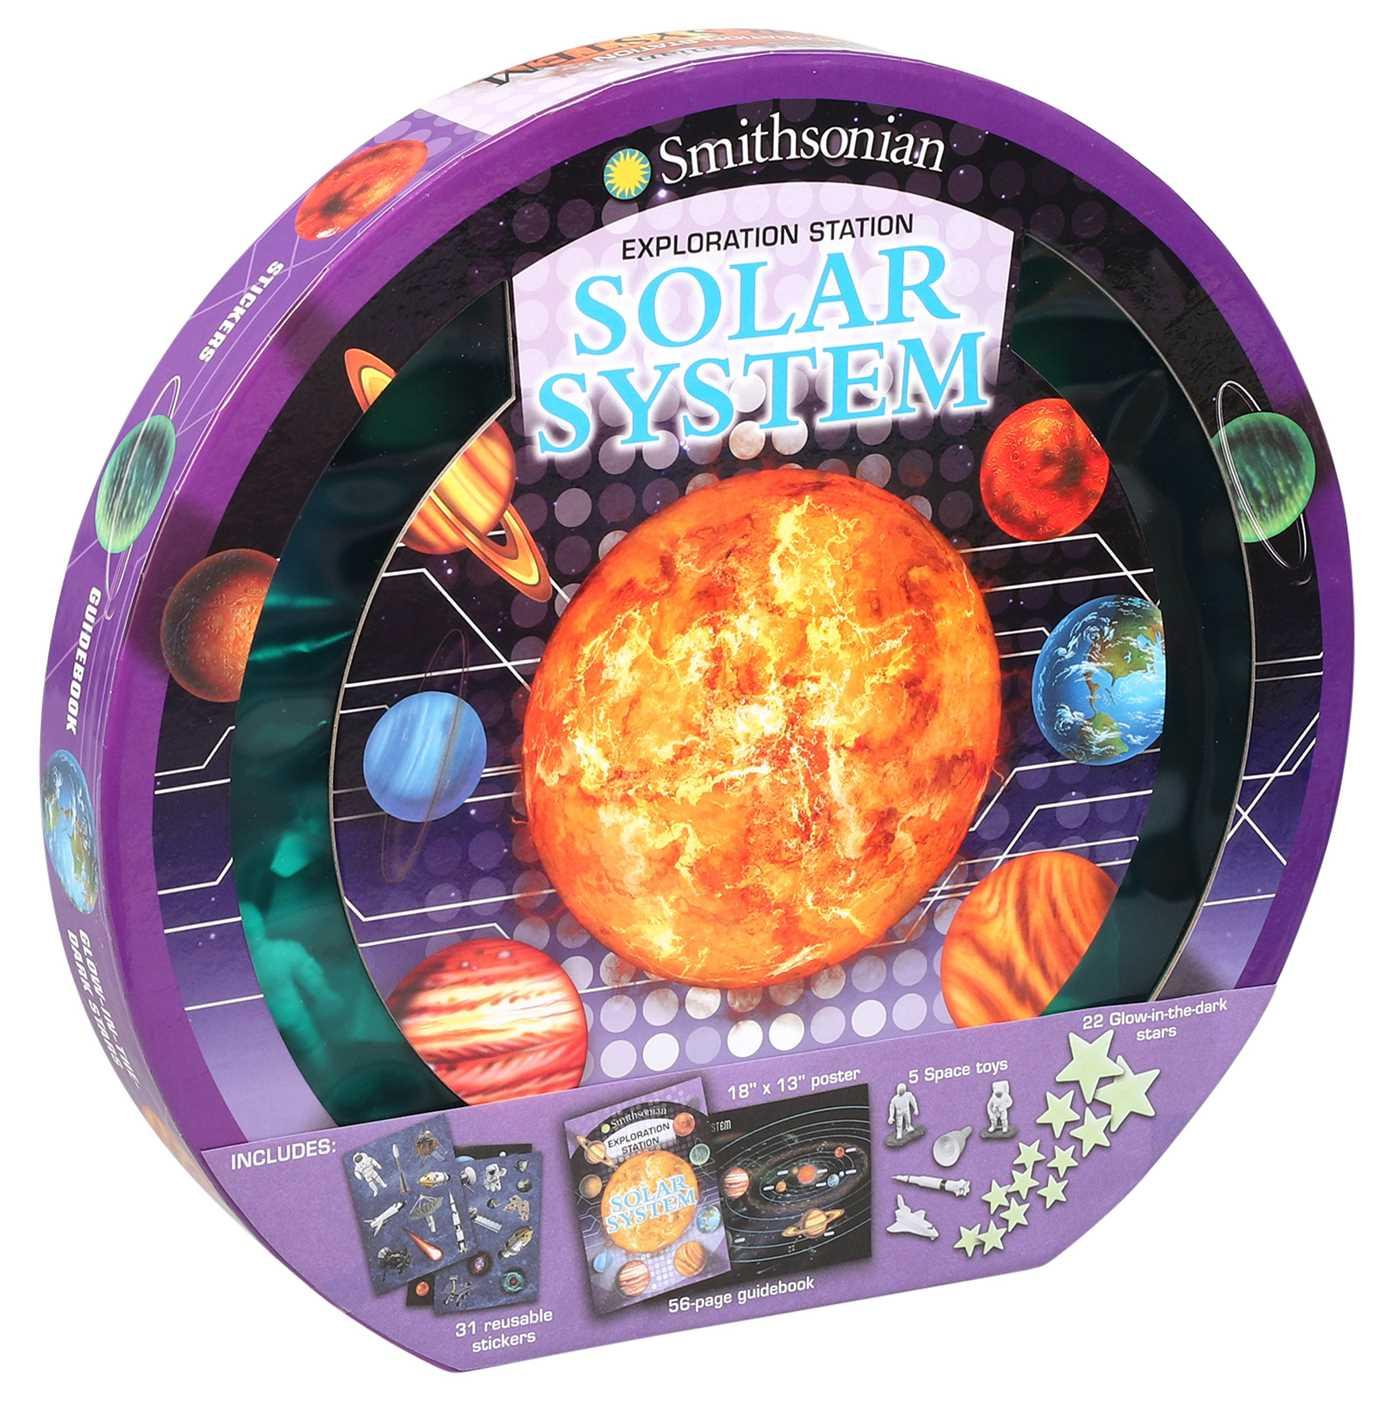 Smithsonian exploration station solar system 9781626867222 hr